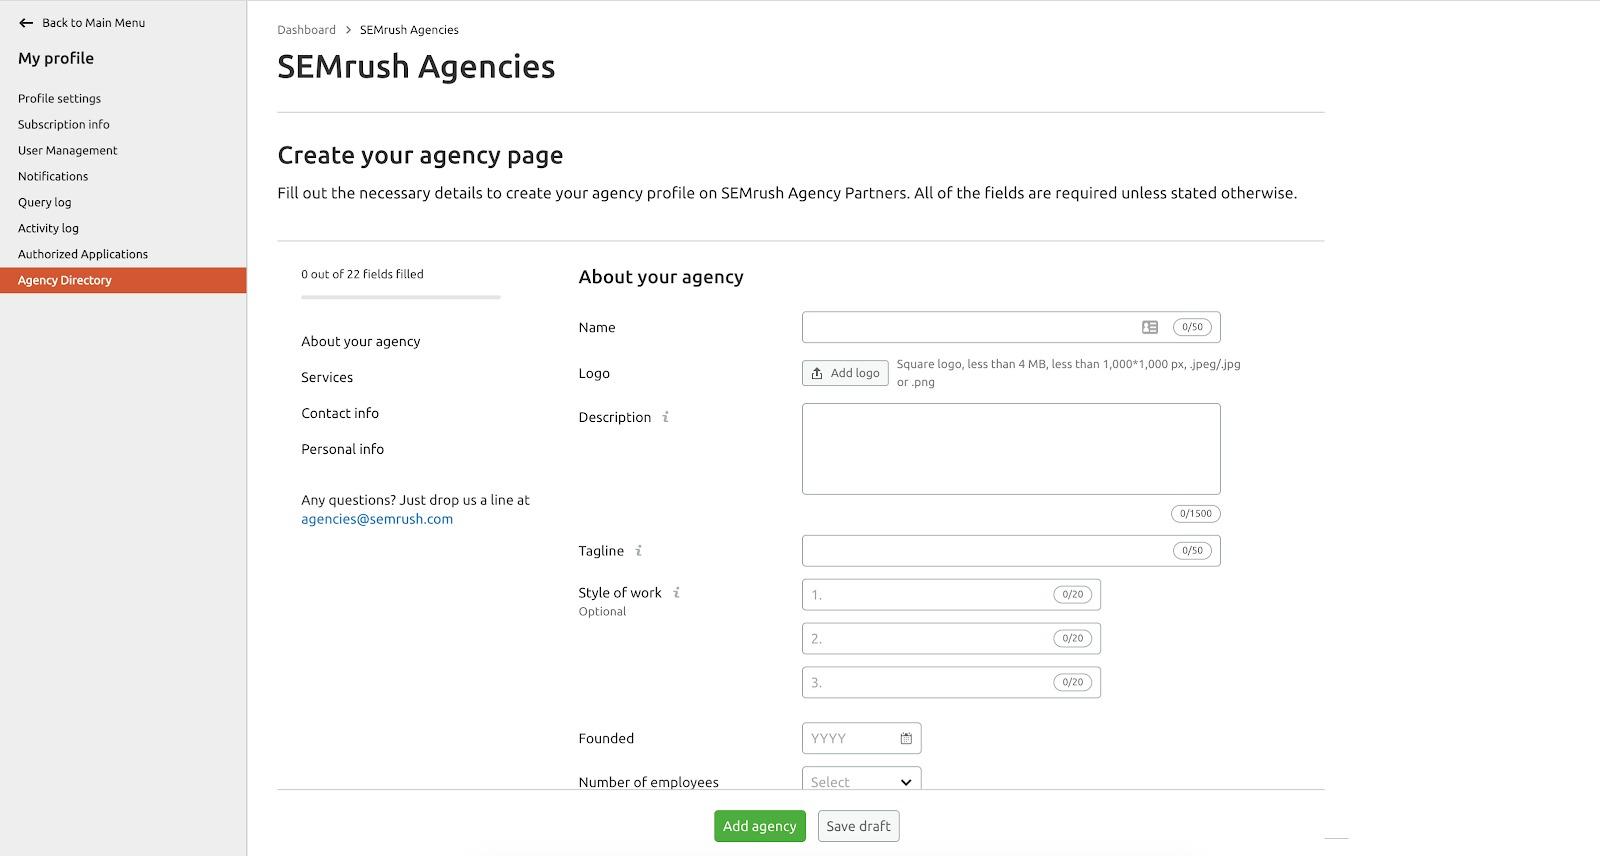 Agency Partners Platform image 4